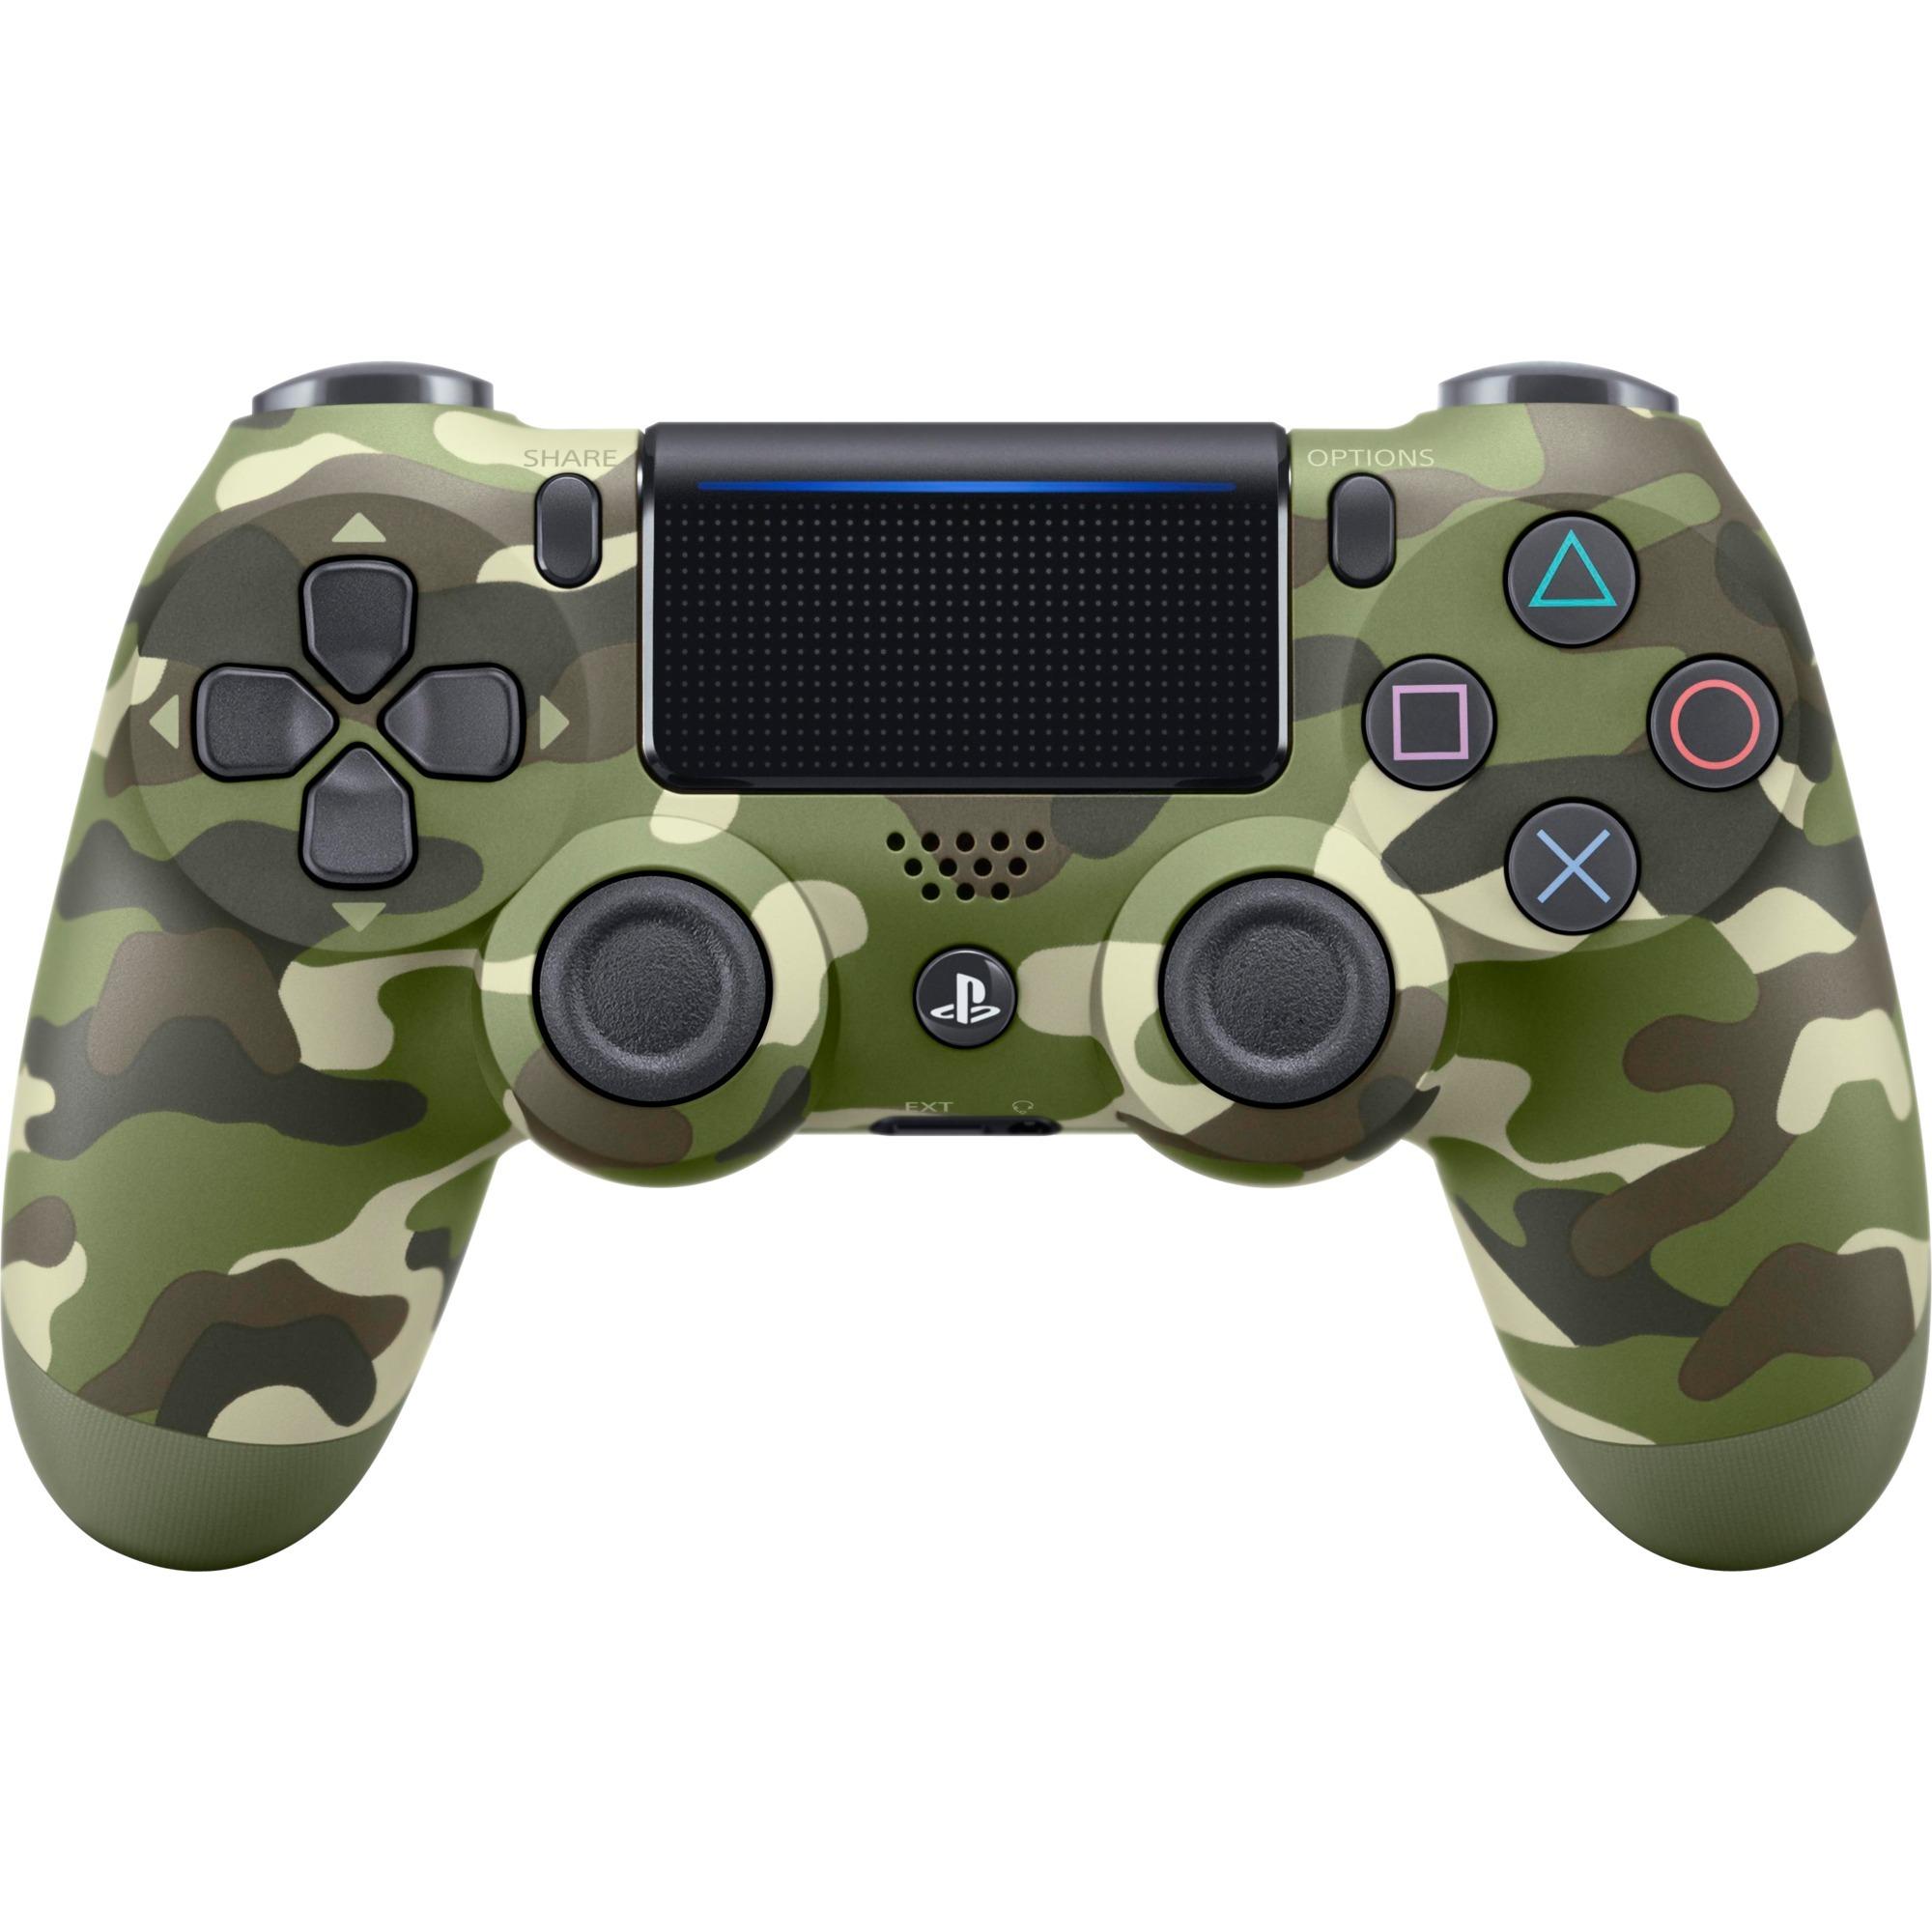 DualShock 4 Gamepad PlayStation 4 Camuflaje, Verde